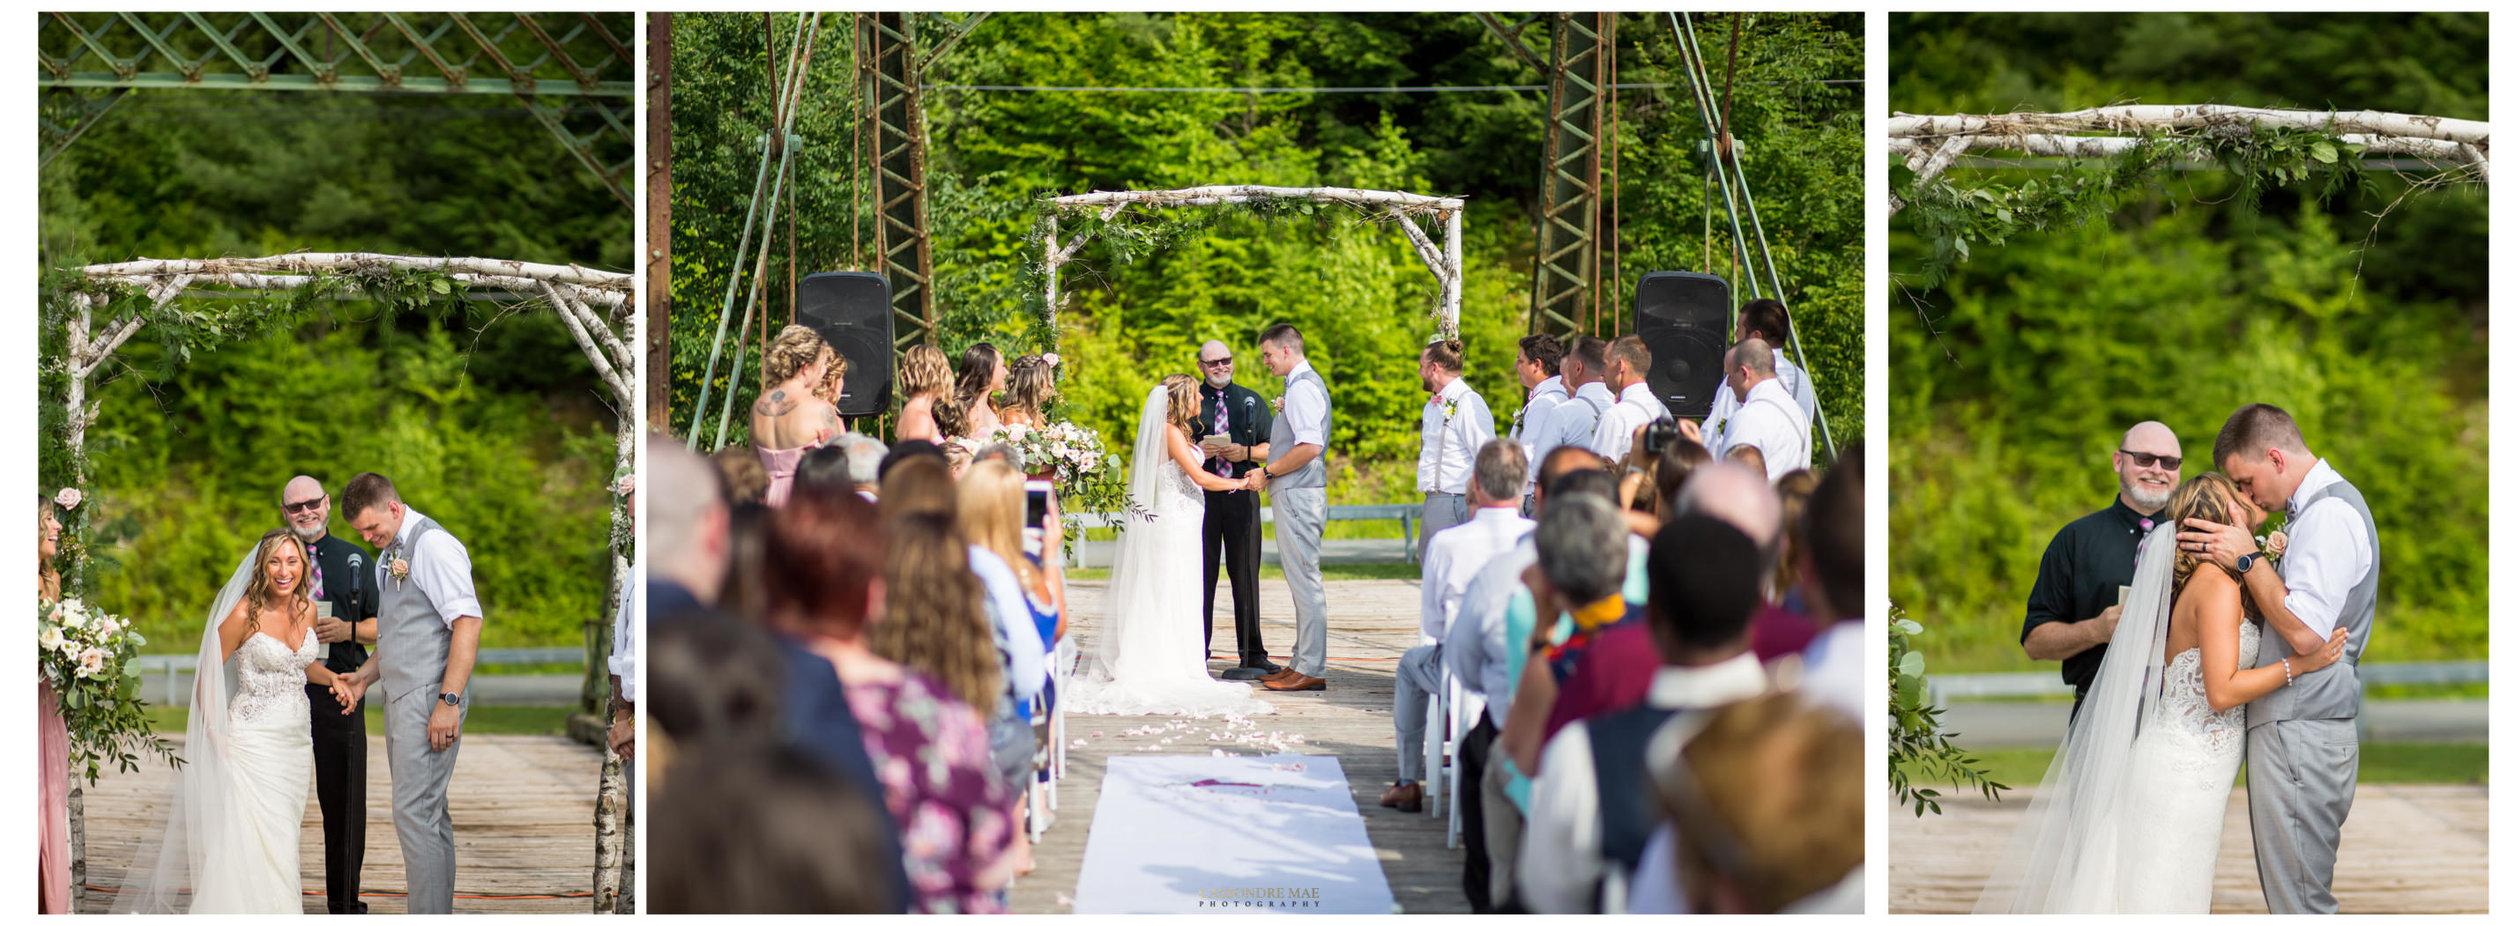 Cassondre Mae Photography Hudson Valley Wedding 14.jpg